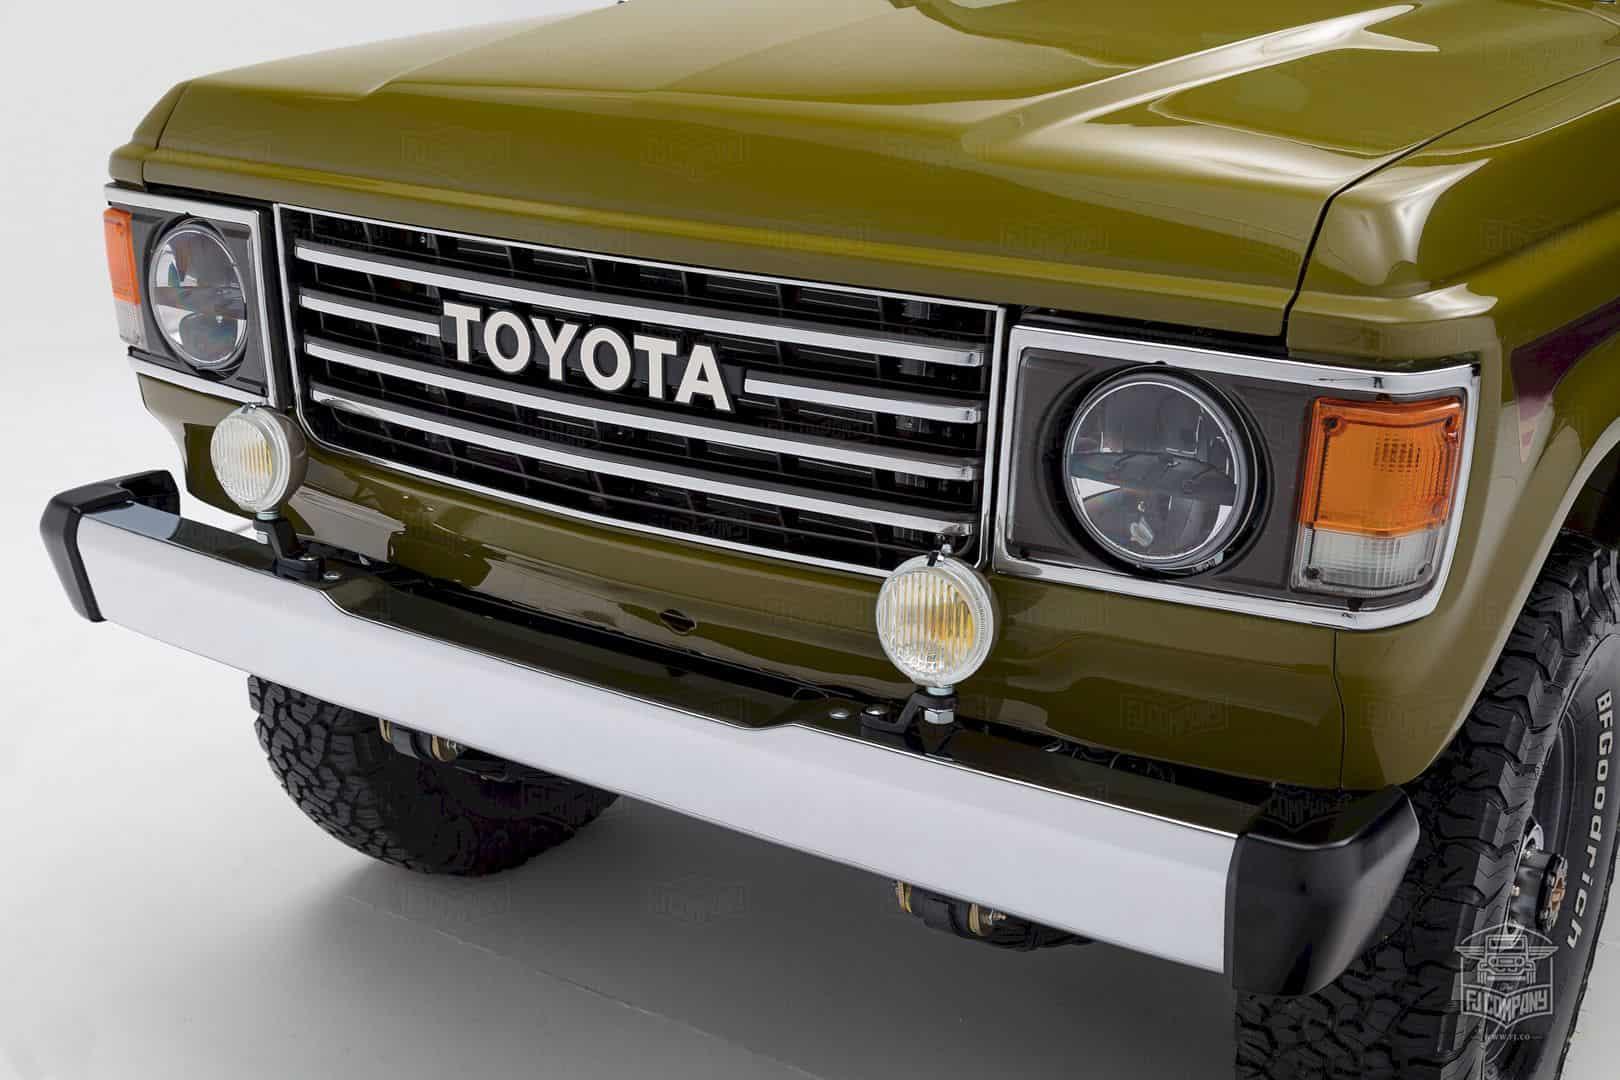 1986 Toyota Land Cruiser Fj62 Olive 1